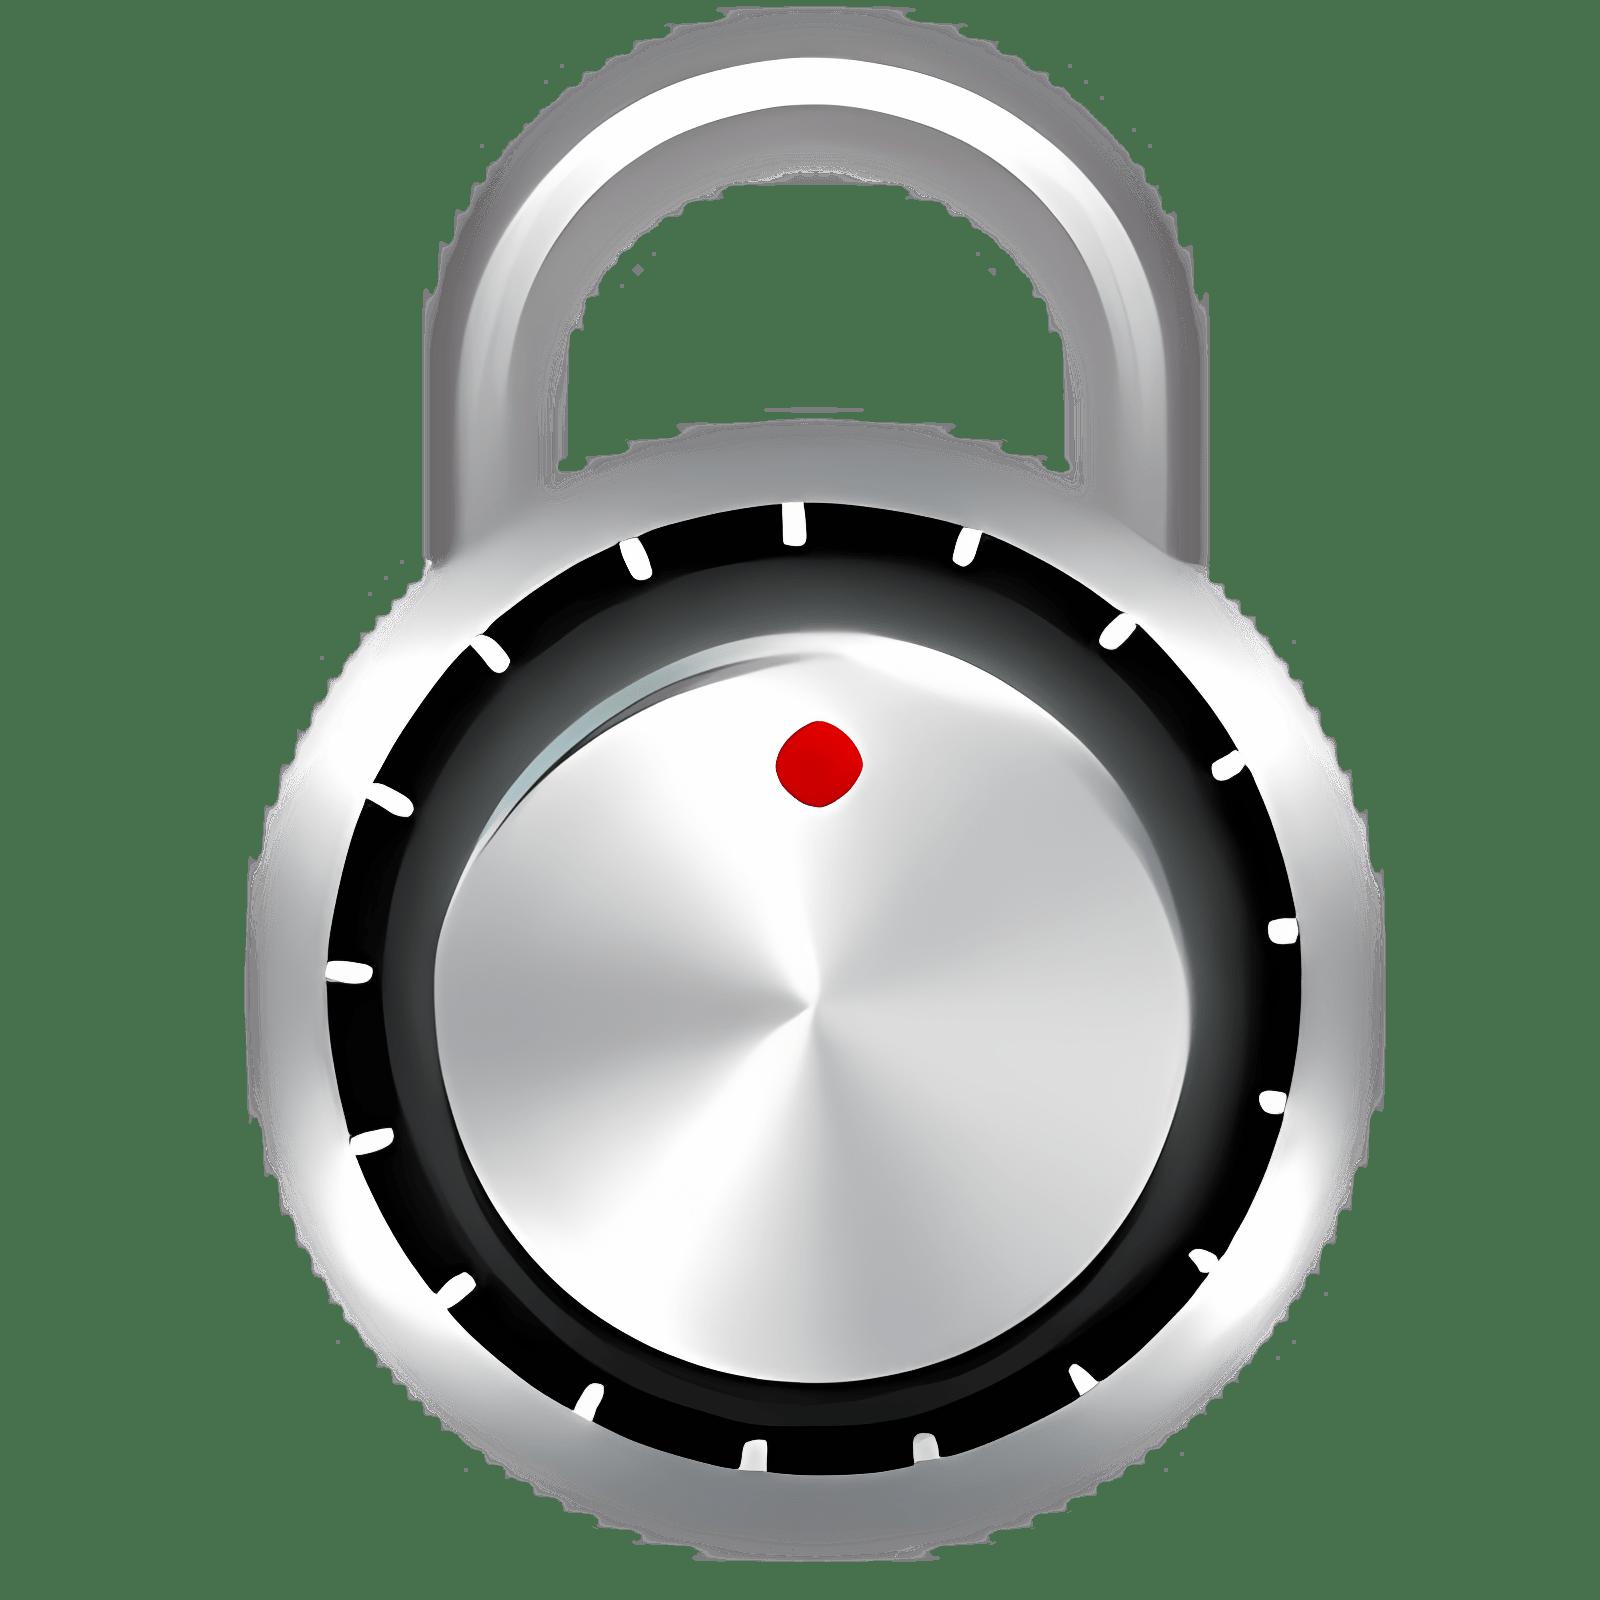 Protected Folder (Password Folder) 1.2.0.0-20150715